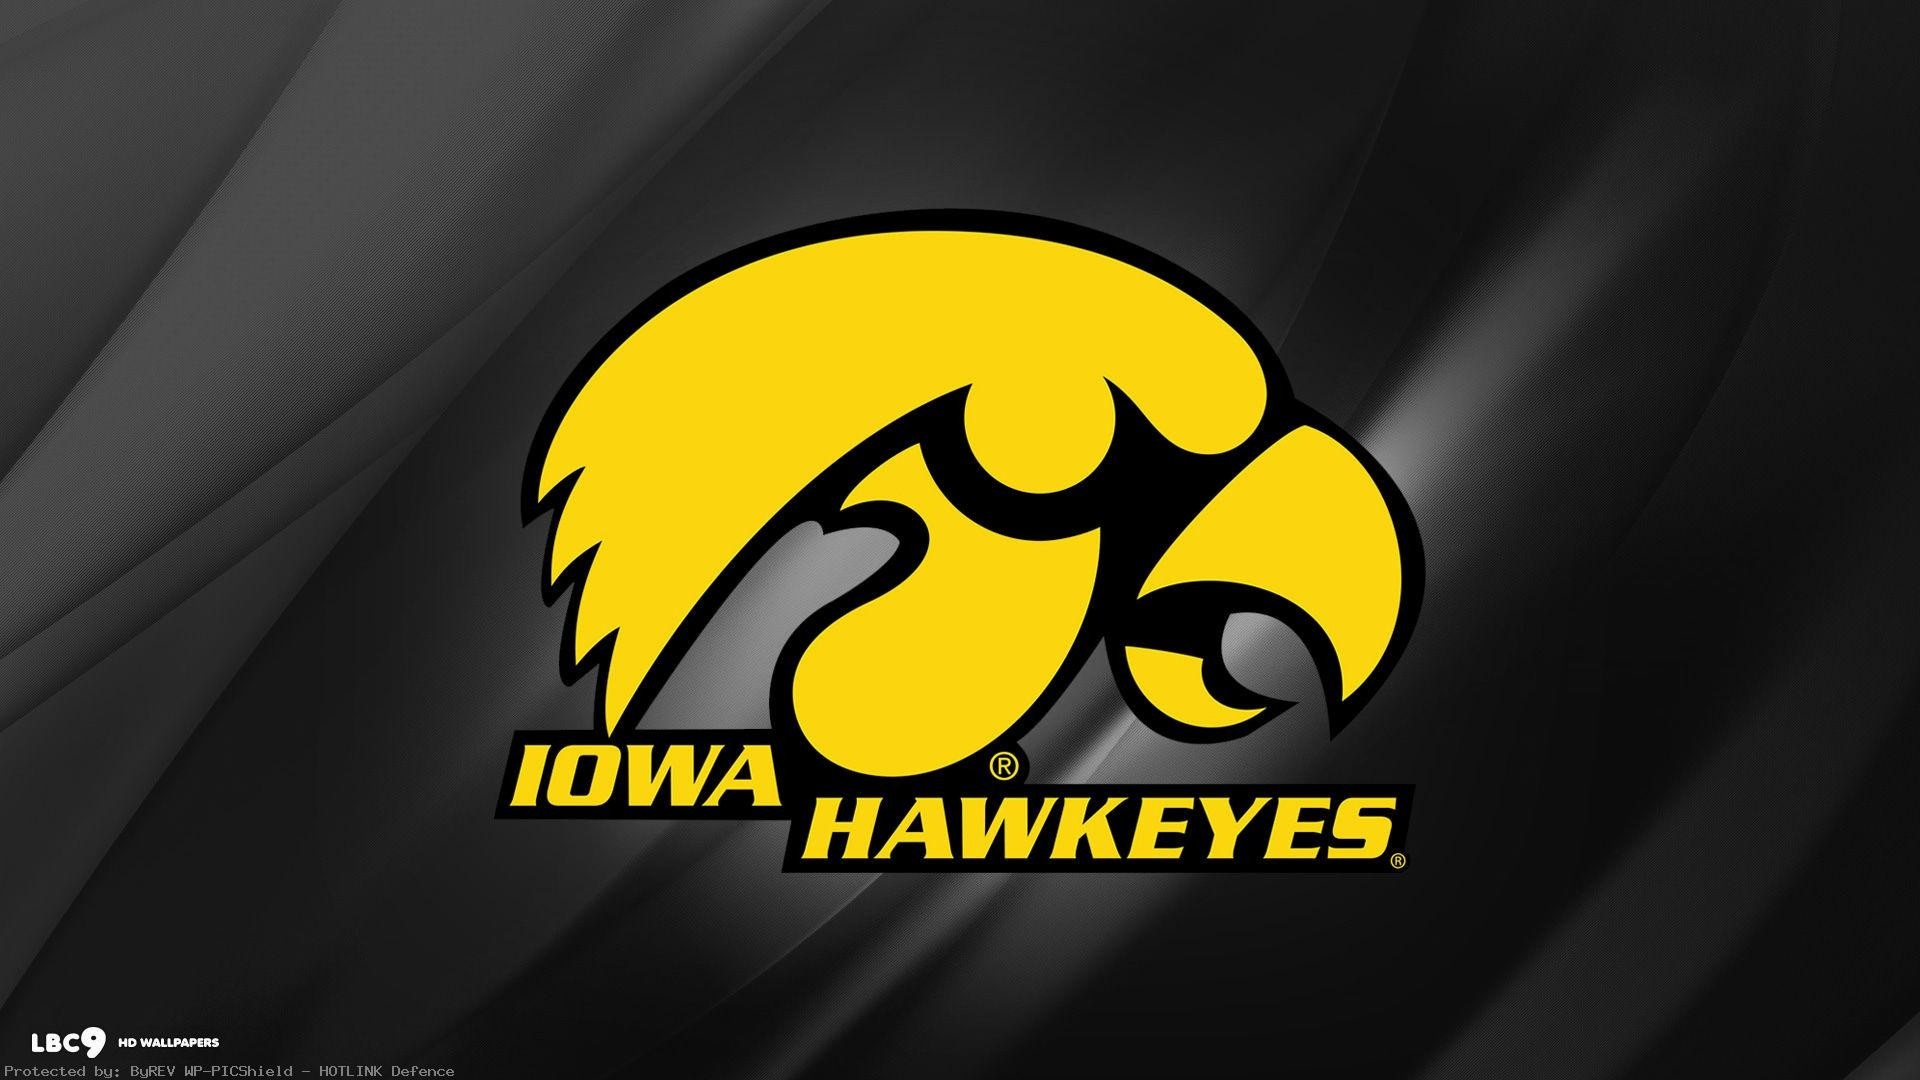 Iowa Hawkeyes Wallpaper 64 images 1920x1080